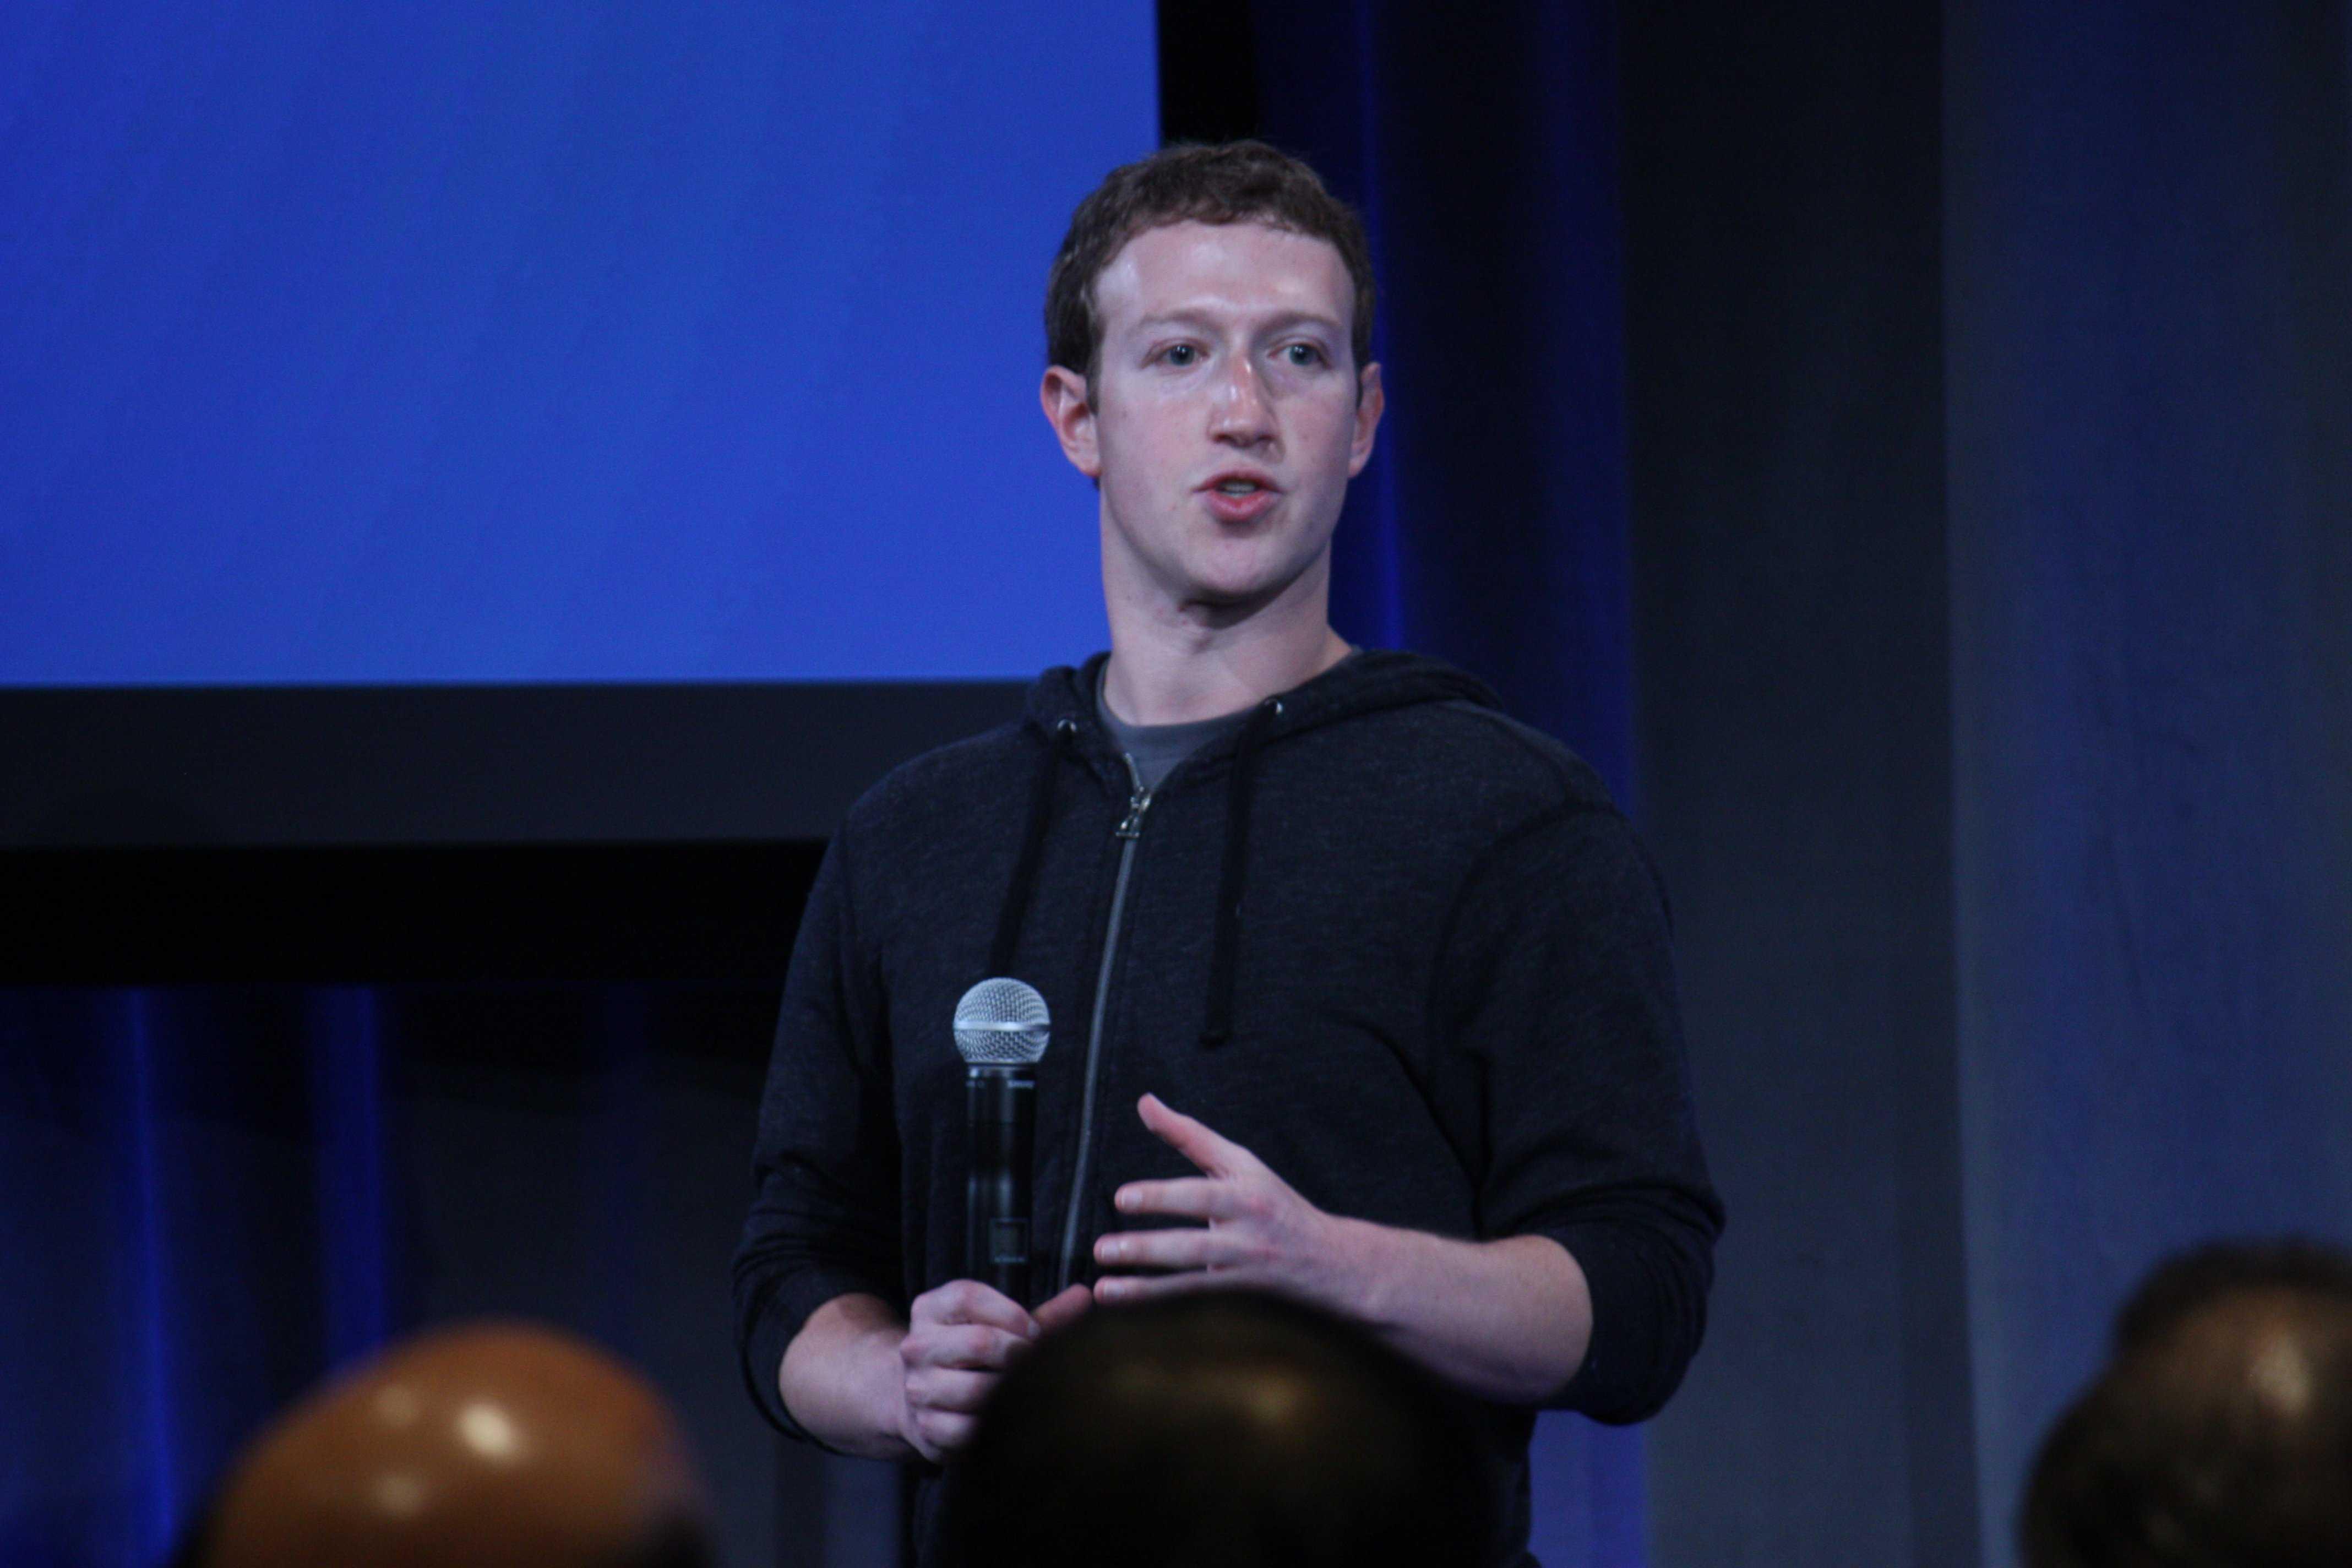 Democratic senators to Mark Zuckerberg: Testify before Congress